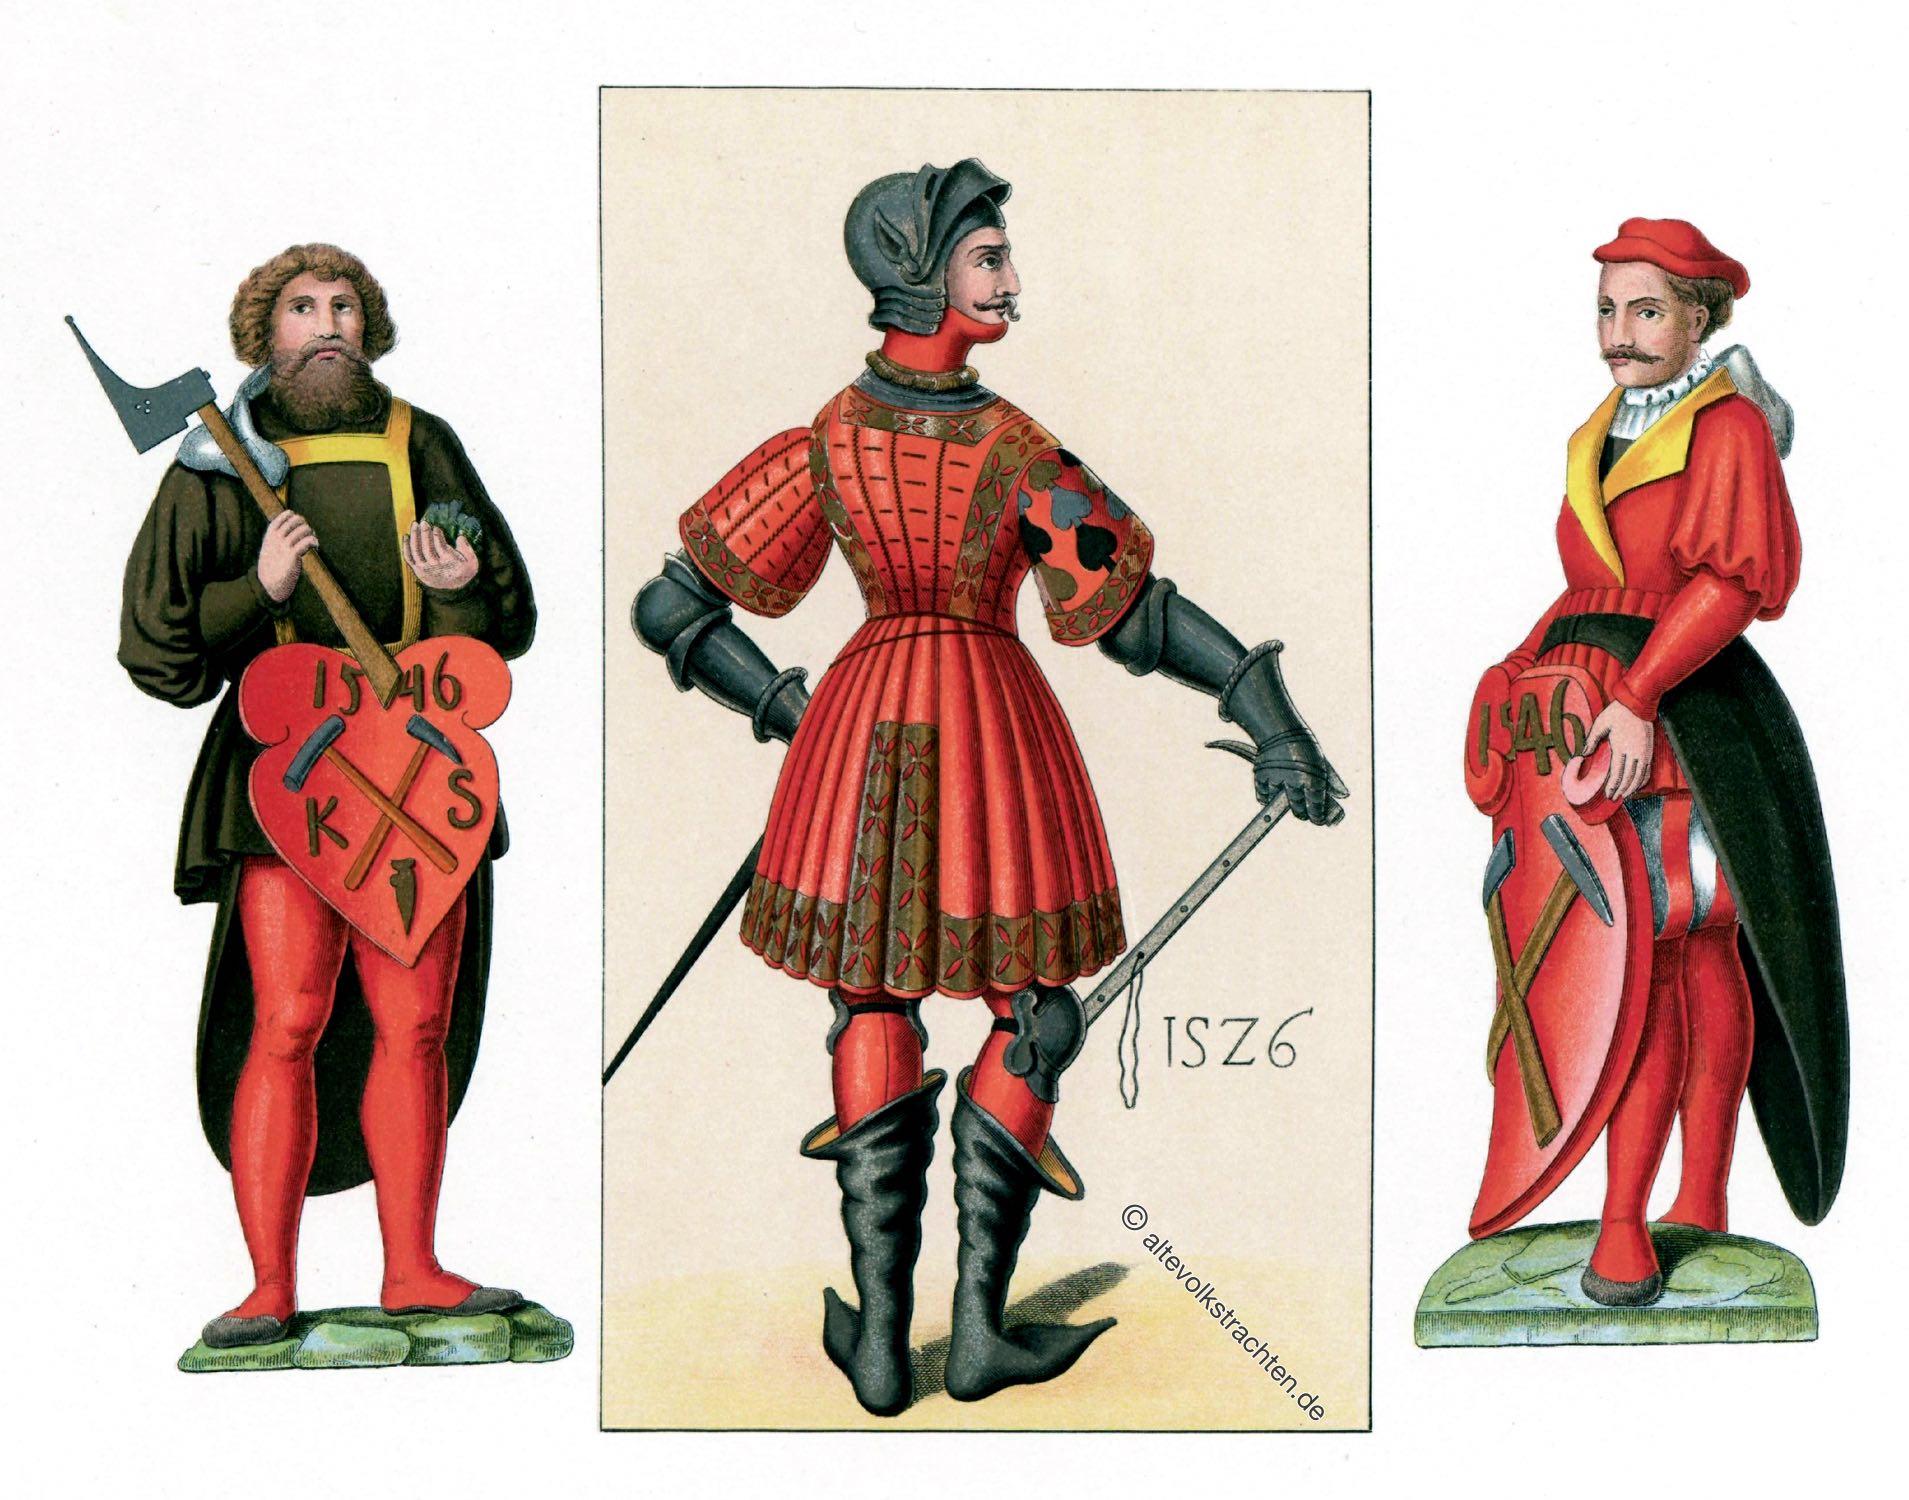 Hefner-Alteneck, Sachsen, Bergleute, Bergbarde, Brandenburgische Hoftracht, Kostümgeschichte, Barock